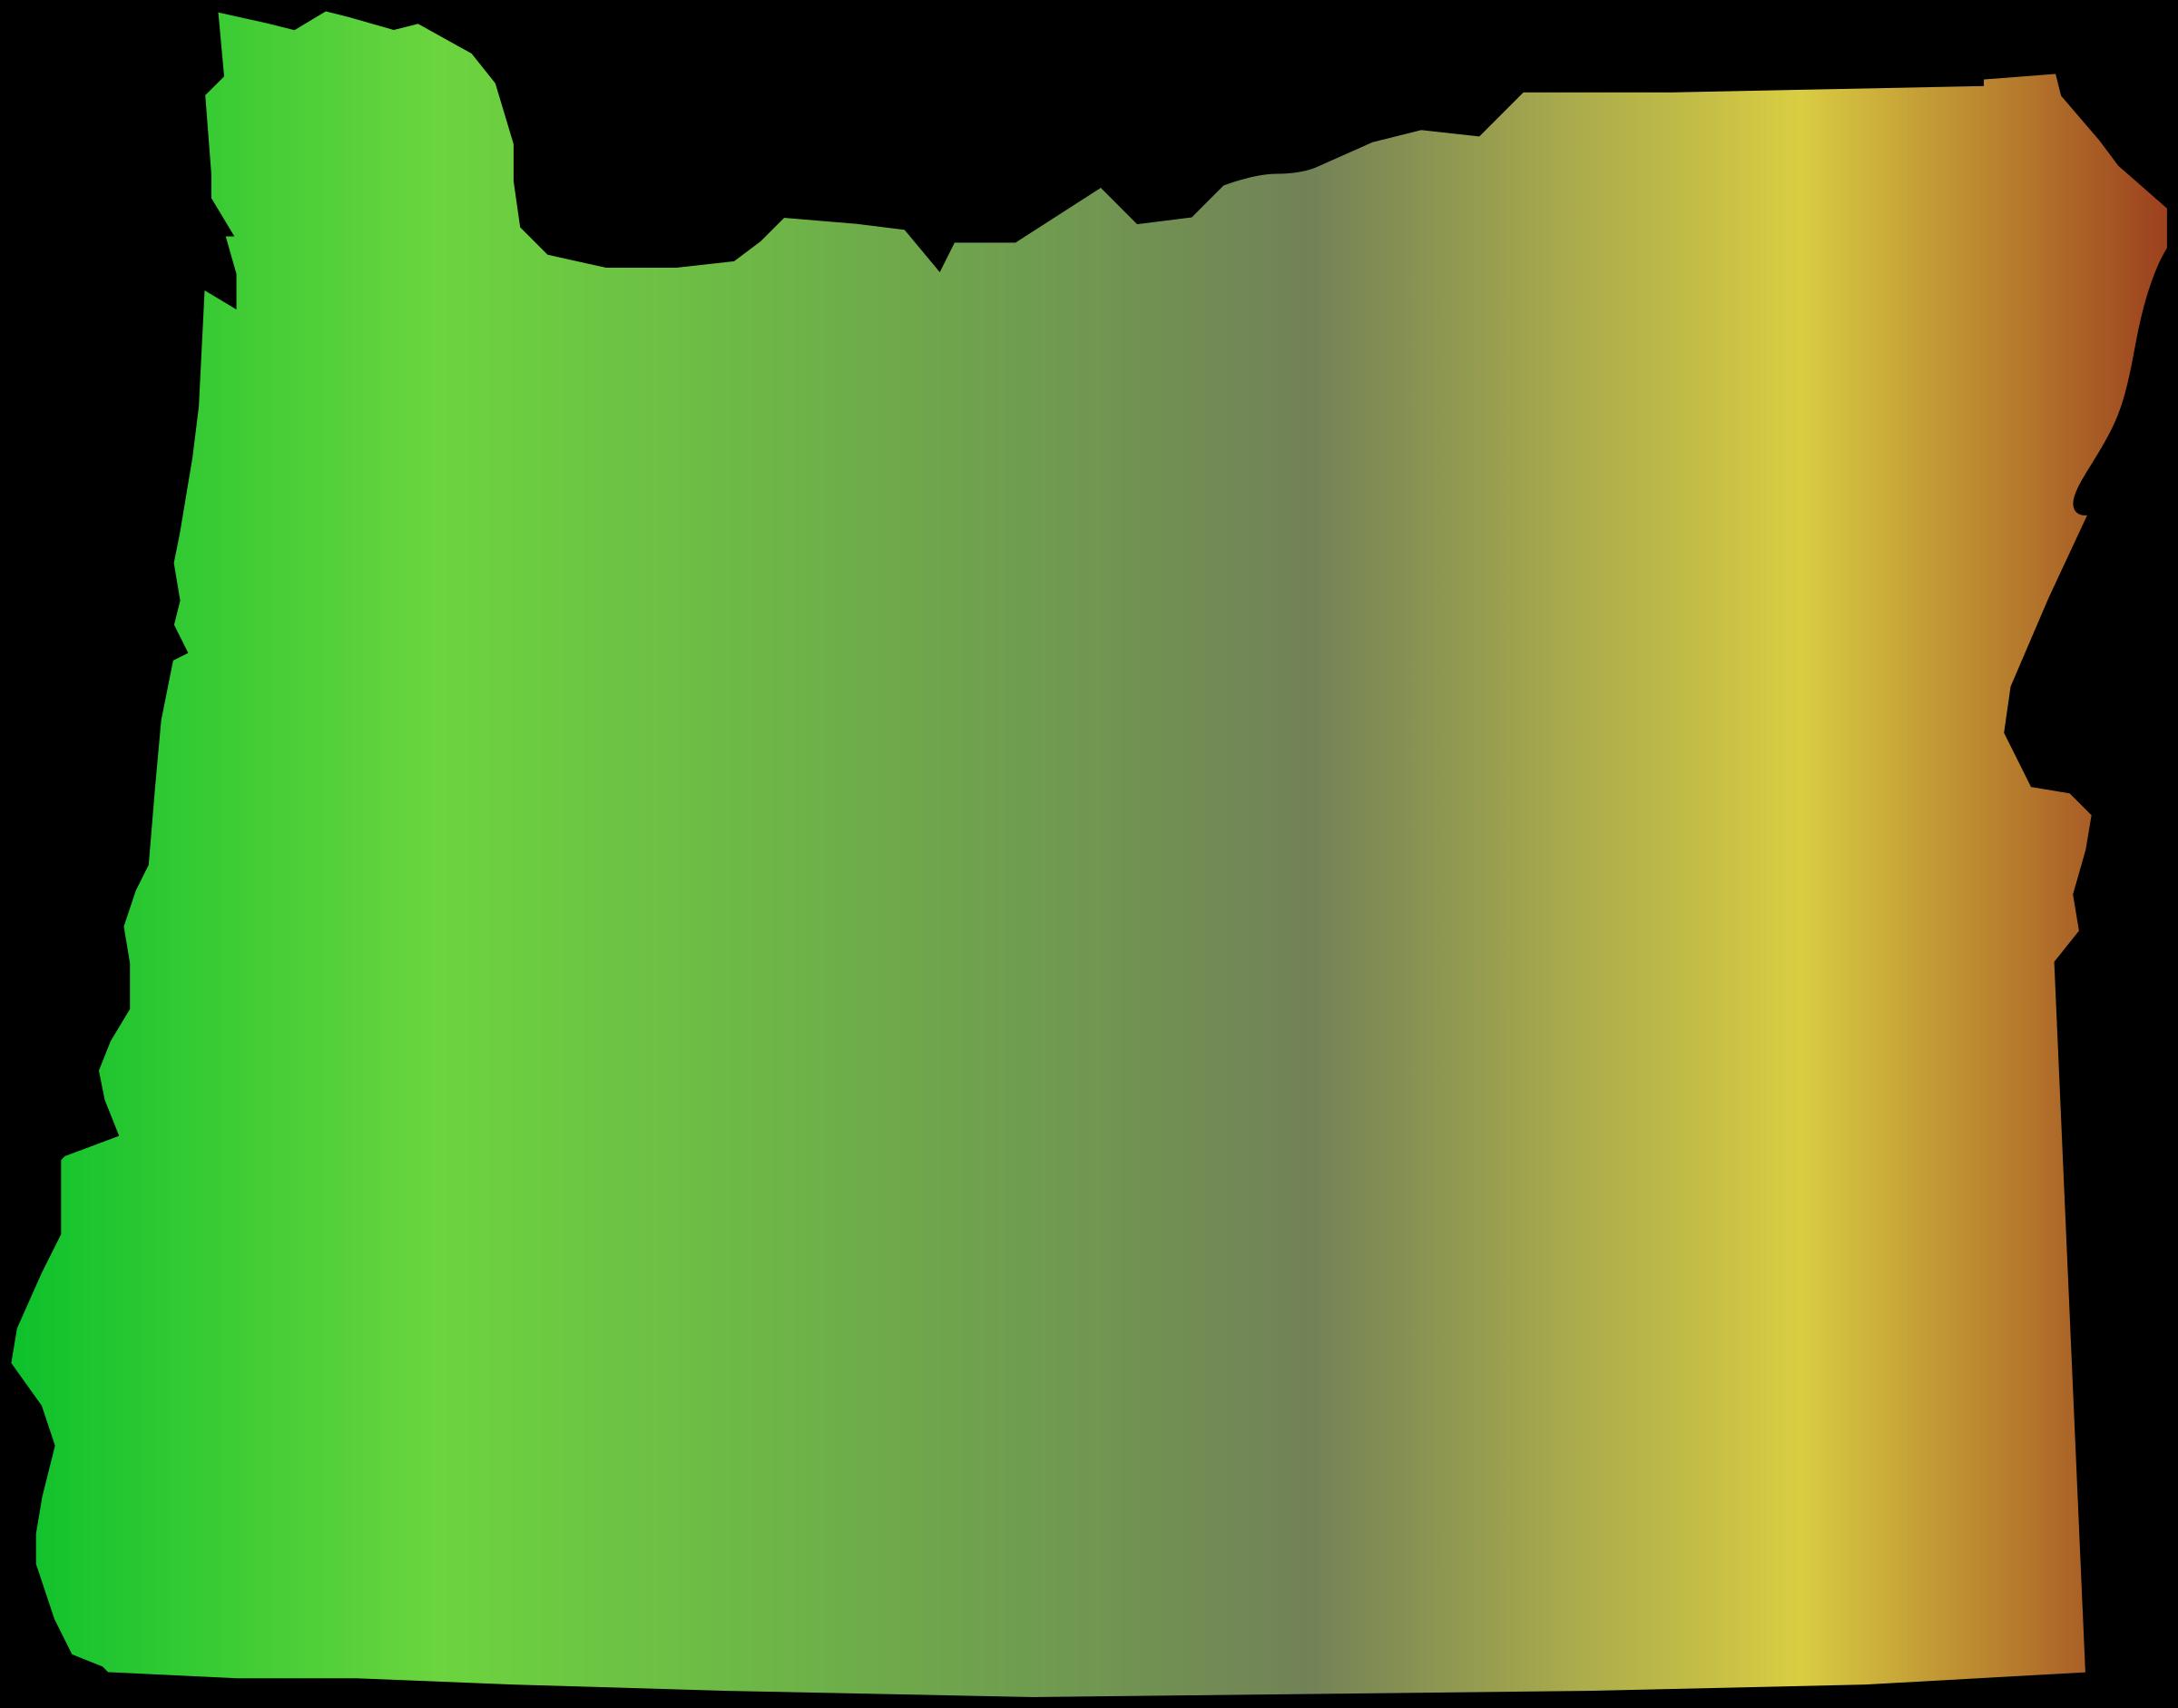 2400x1882 Outline Of Oregon